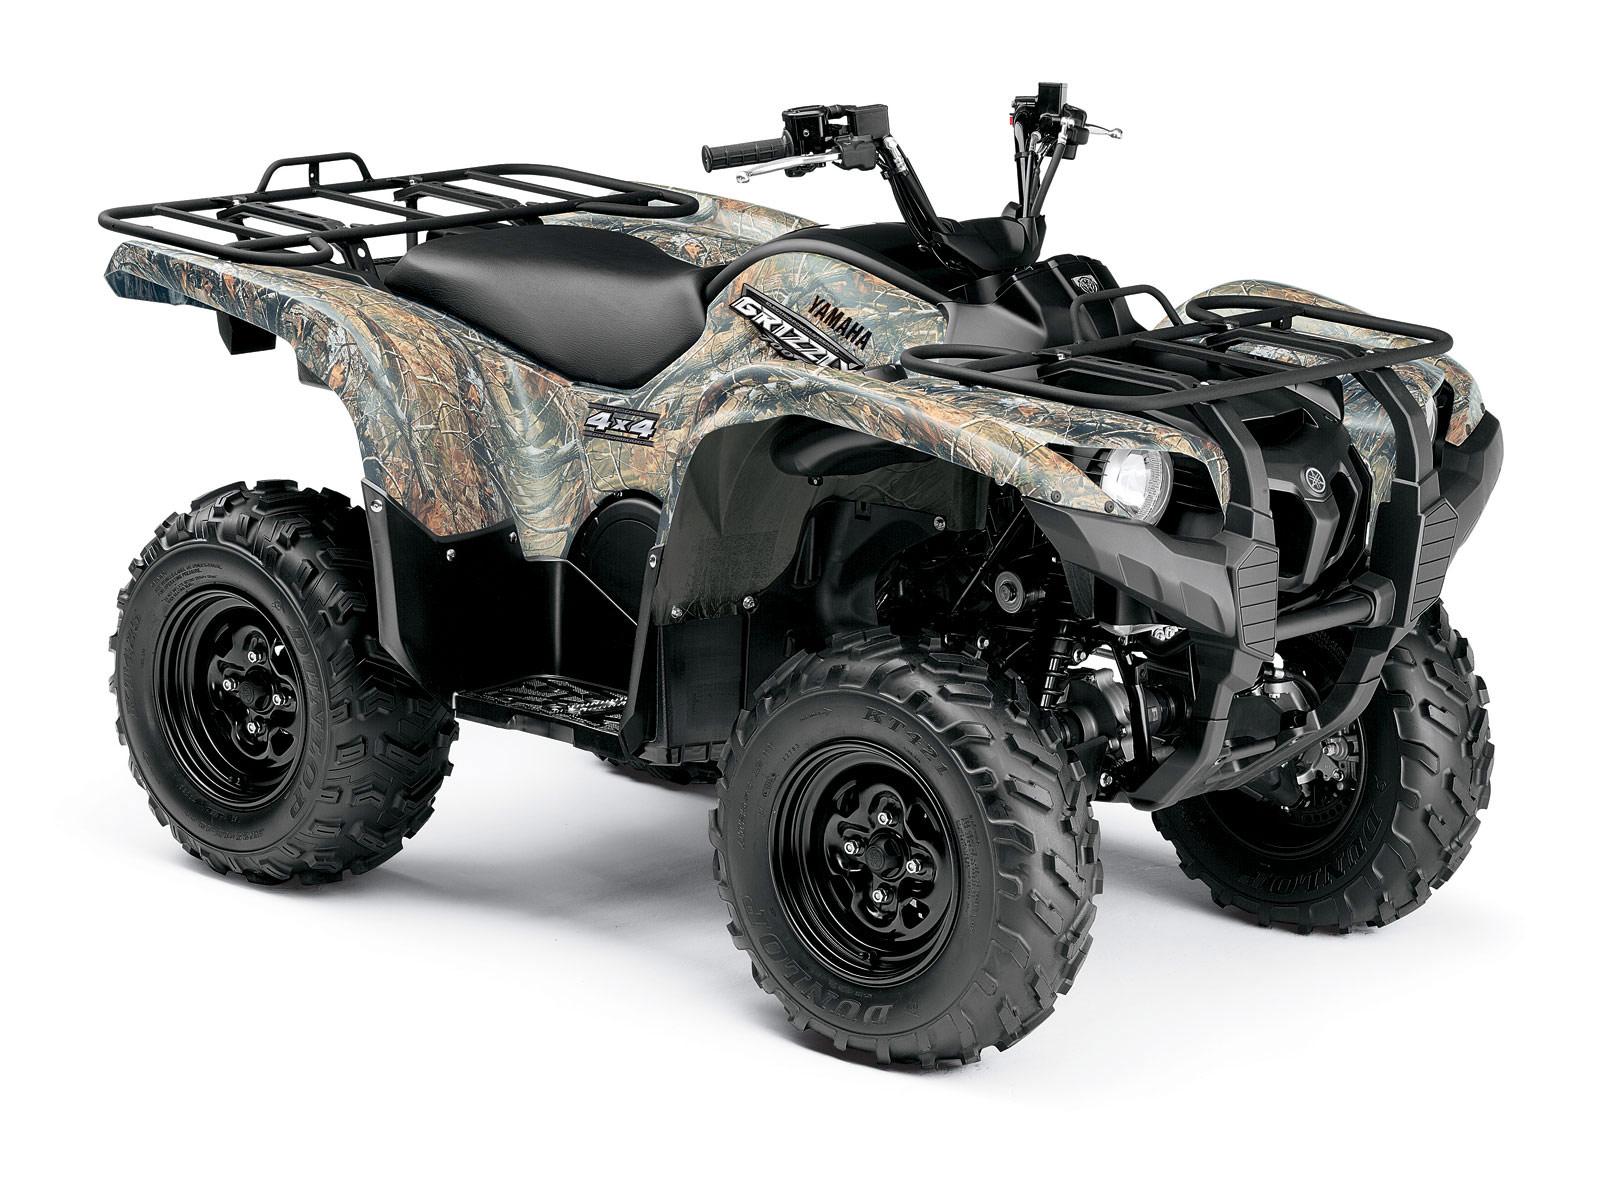 2009 Yamaha Raptor 700 Wiring Diagram Club Car 48 Volt Battery 07 Wolverine